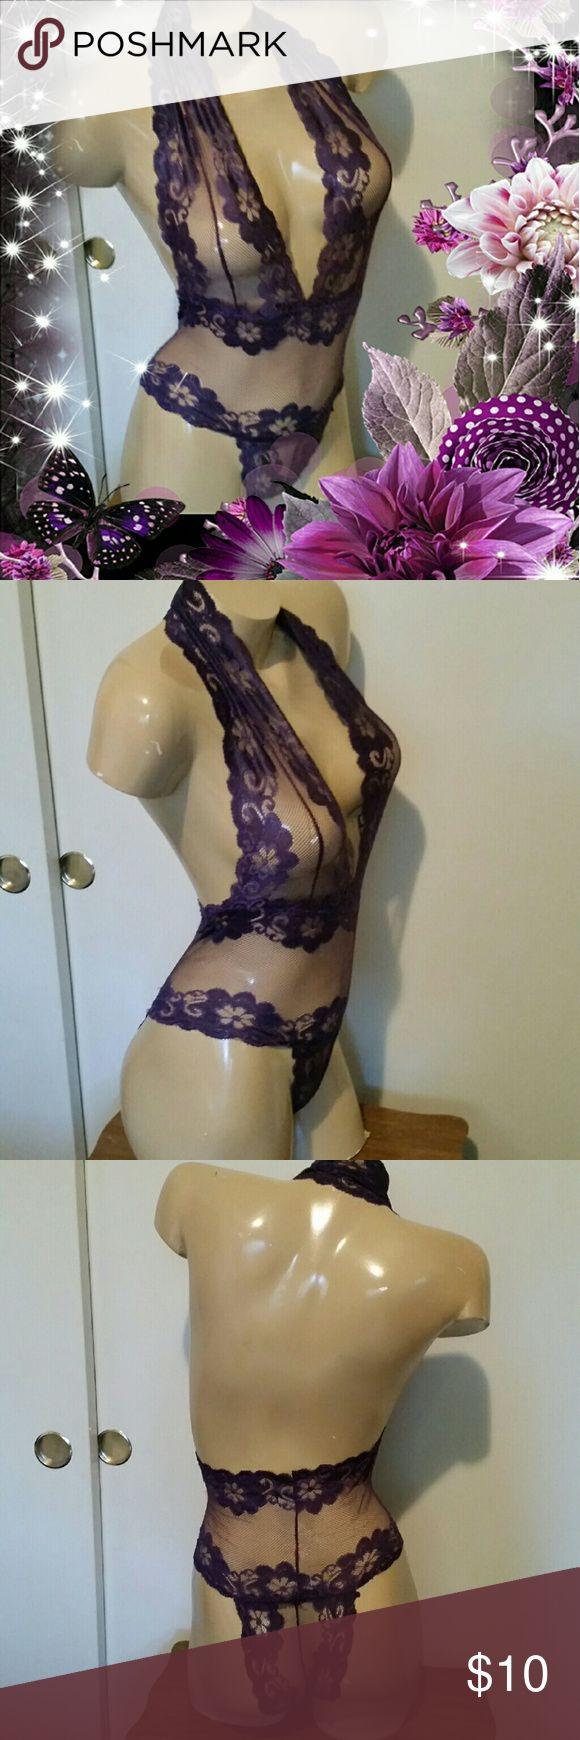 die besten 25 purple lace lingerie ideen auf pinterest violette dessous lila band und